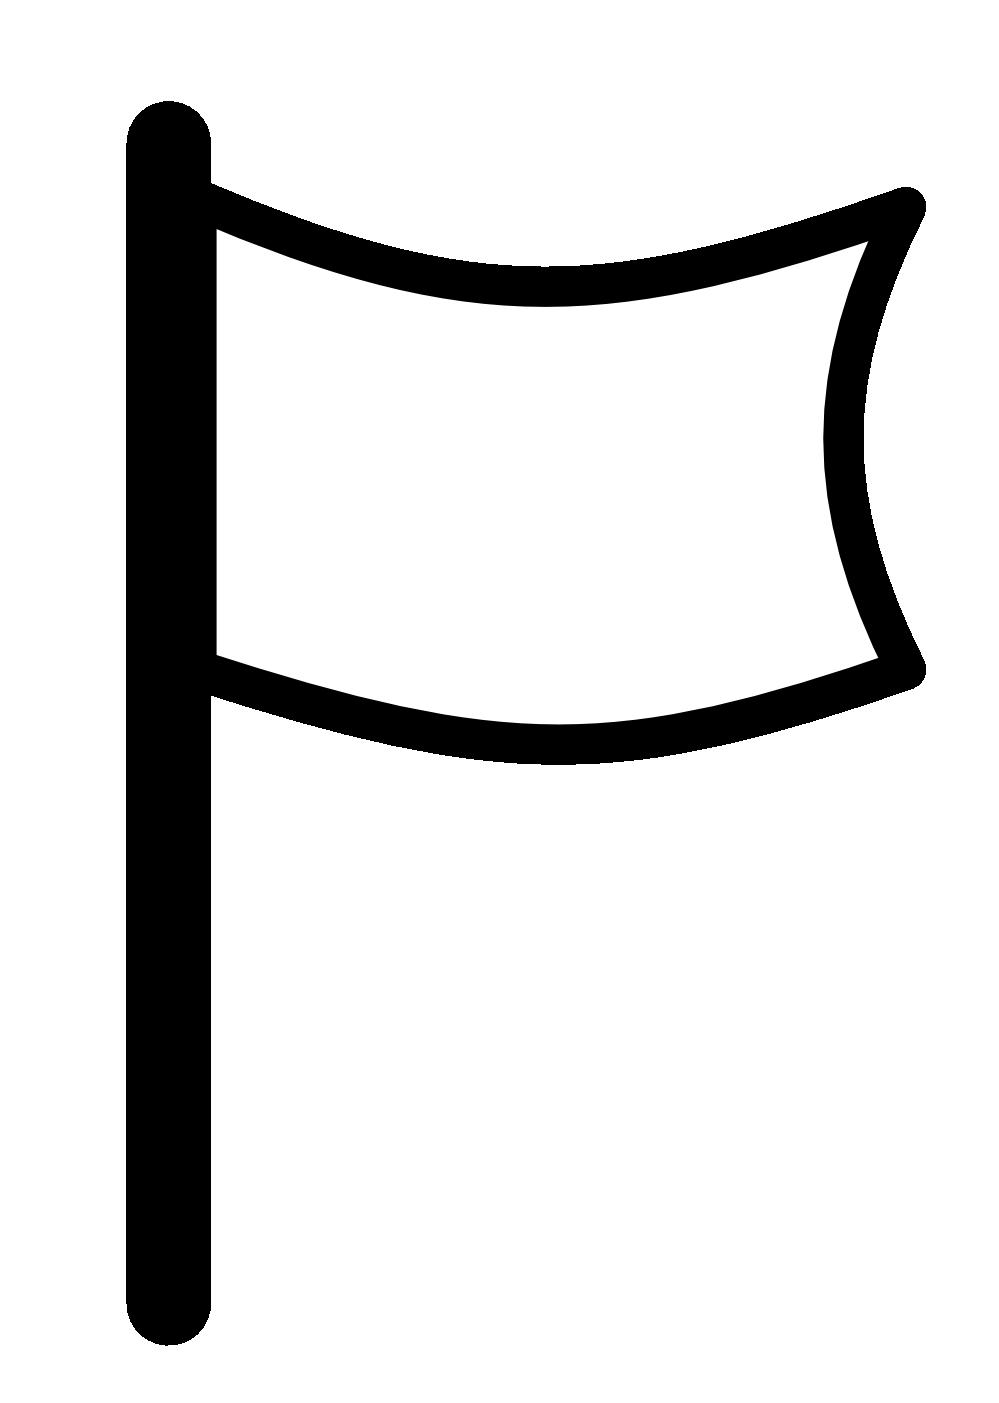 Football pennant clipart jpg black and white stock Flag Clip Art Free | Clipart Panda - Free Clipart Images jpg black and white stock